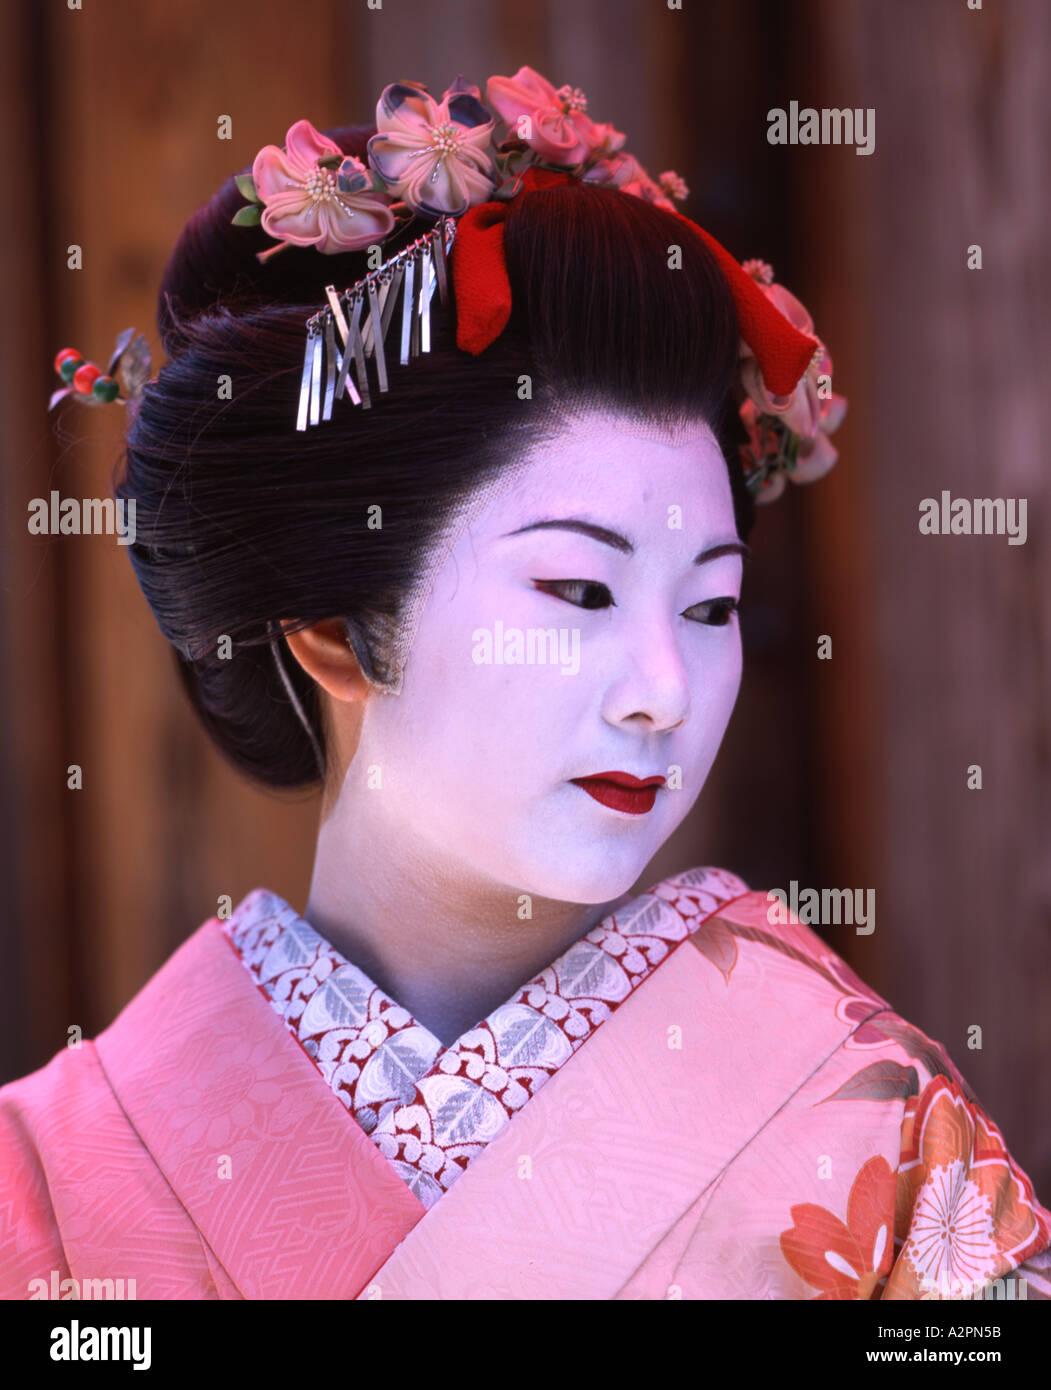 9a25a2a311 Girl in maiko trainee Geisha costume in Japanese garden of Gion Kyoto  Wearing kimono obi wig parasol makeup lipstick